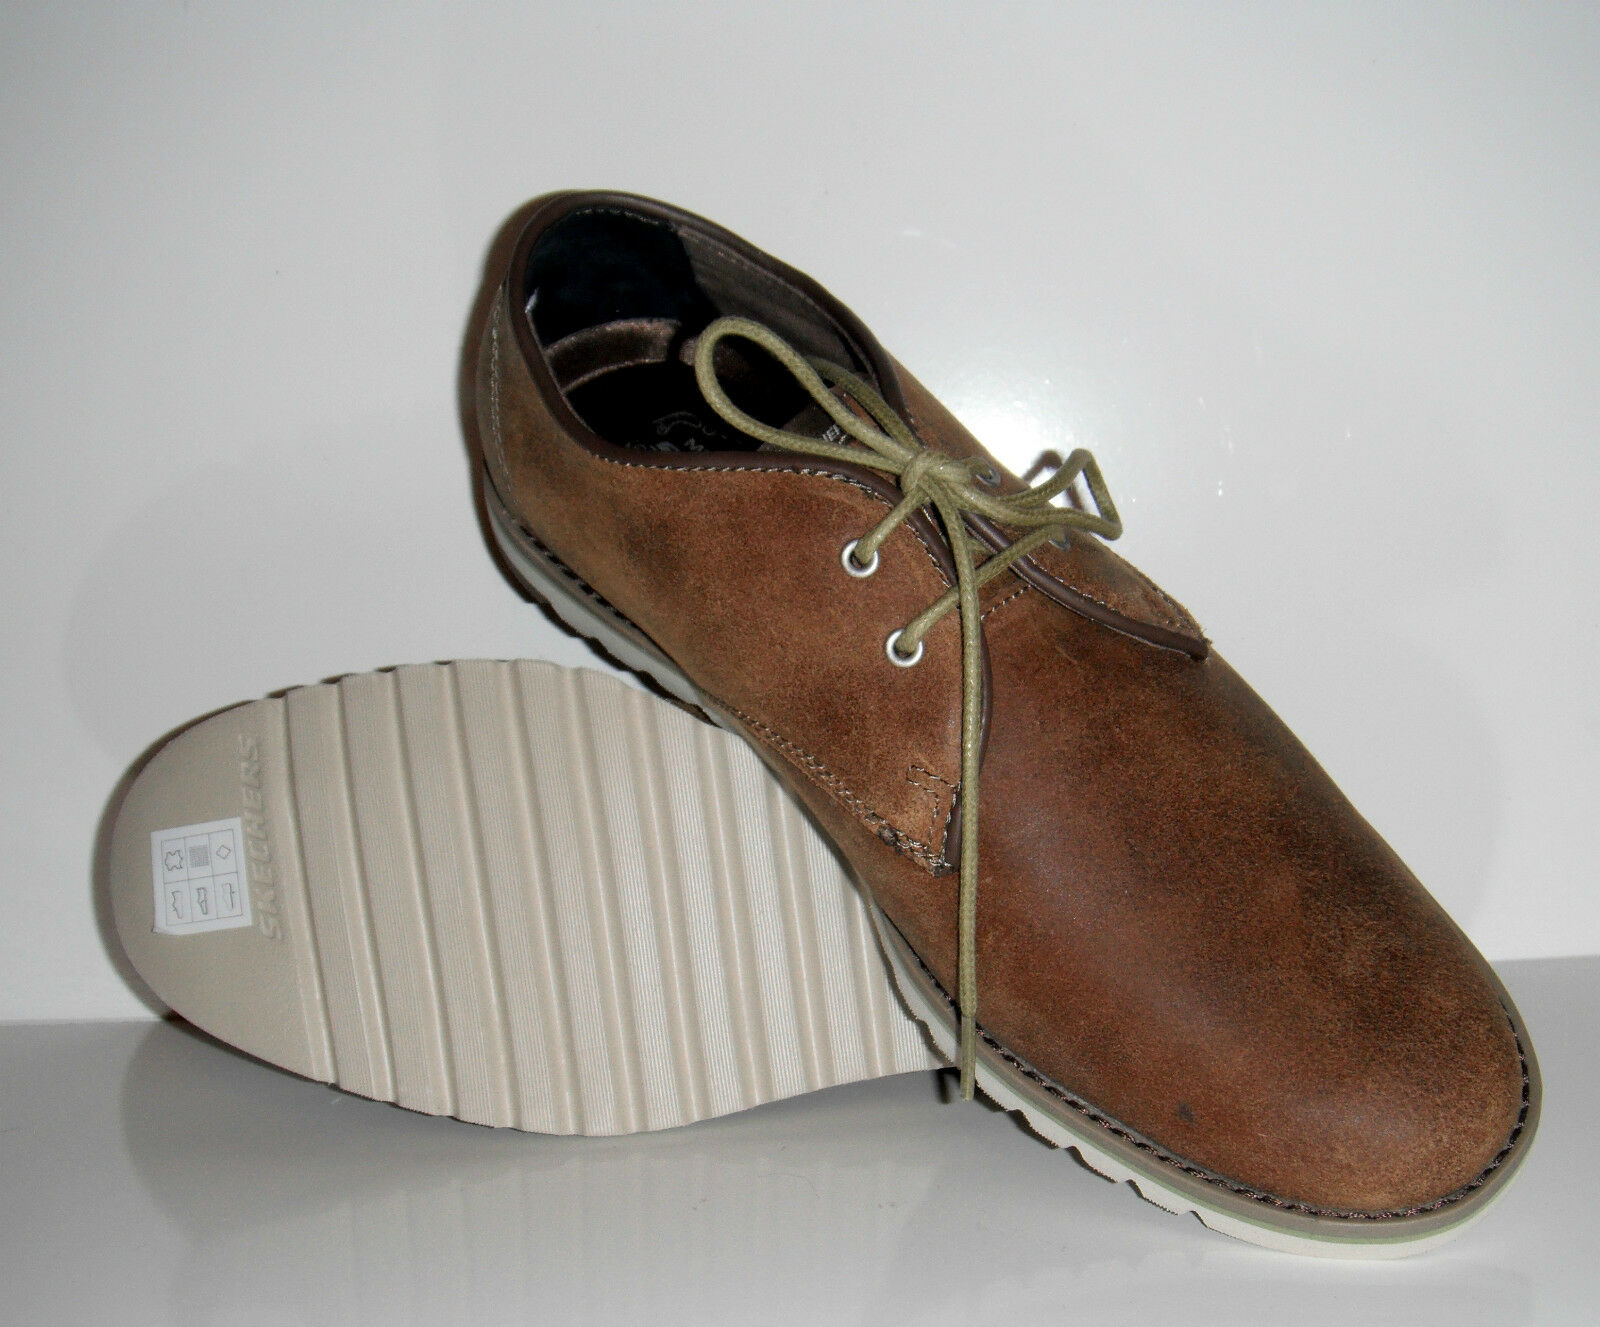 110 New Skechers Men Ribley Monaco Lightweight Brown Suede Oxfords shoes sz 8.5M